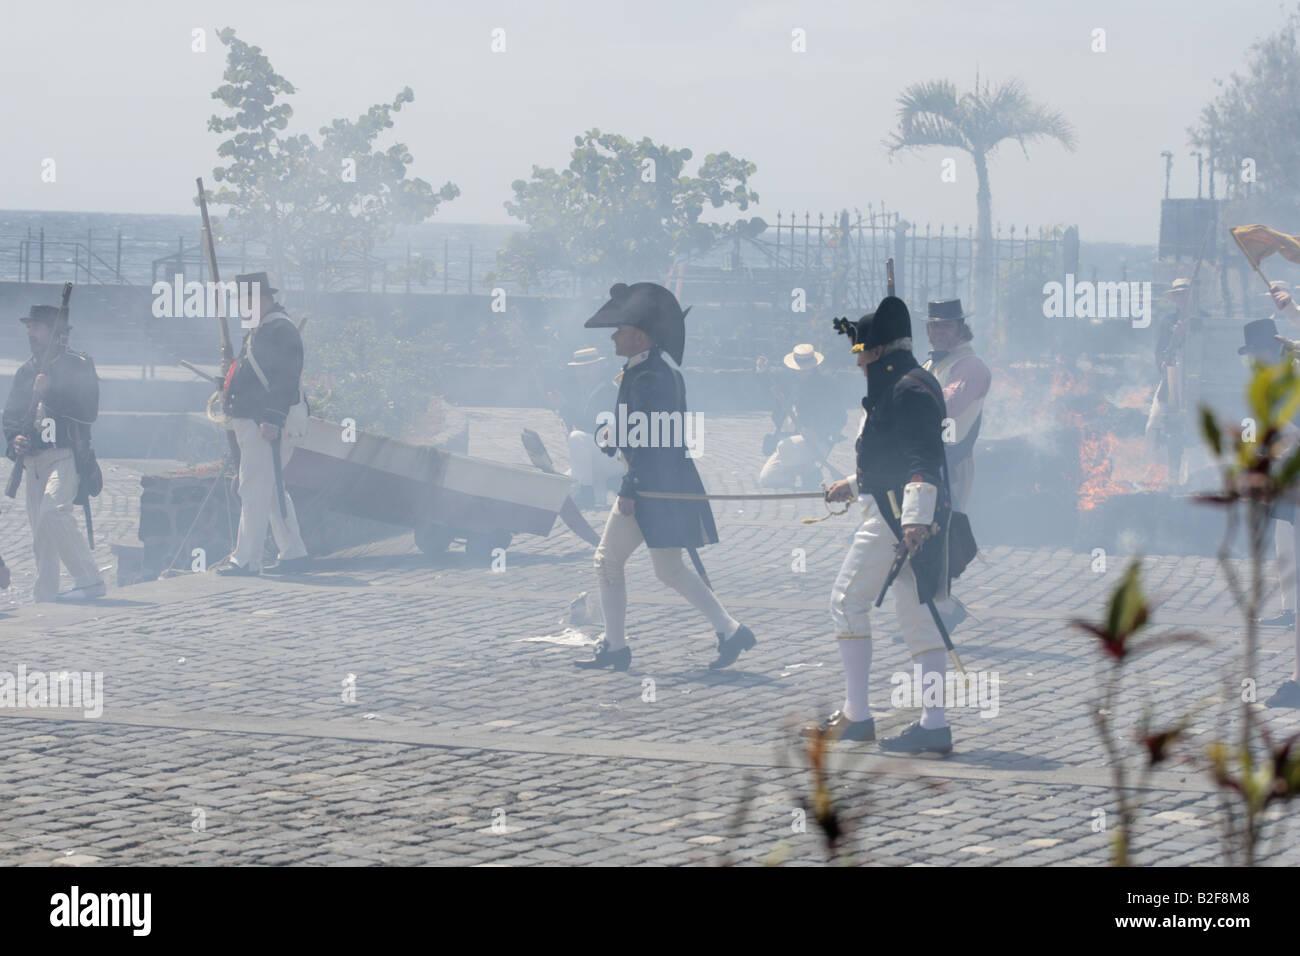 Captain Troughbridge and English troops move through a smoky haze during a reenactment of the 1797 battle of Santa Cruz, Tenerife Stock Photo